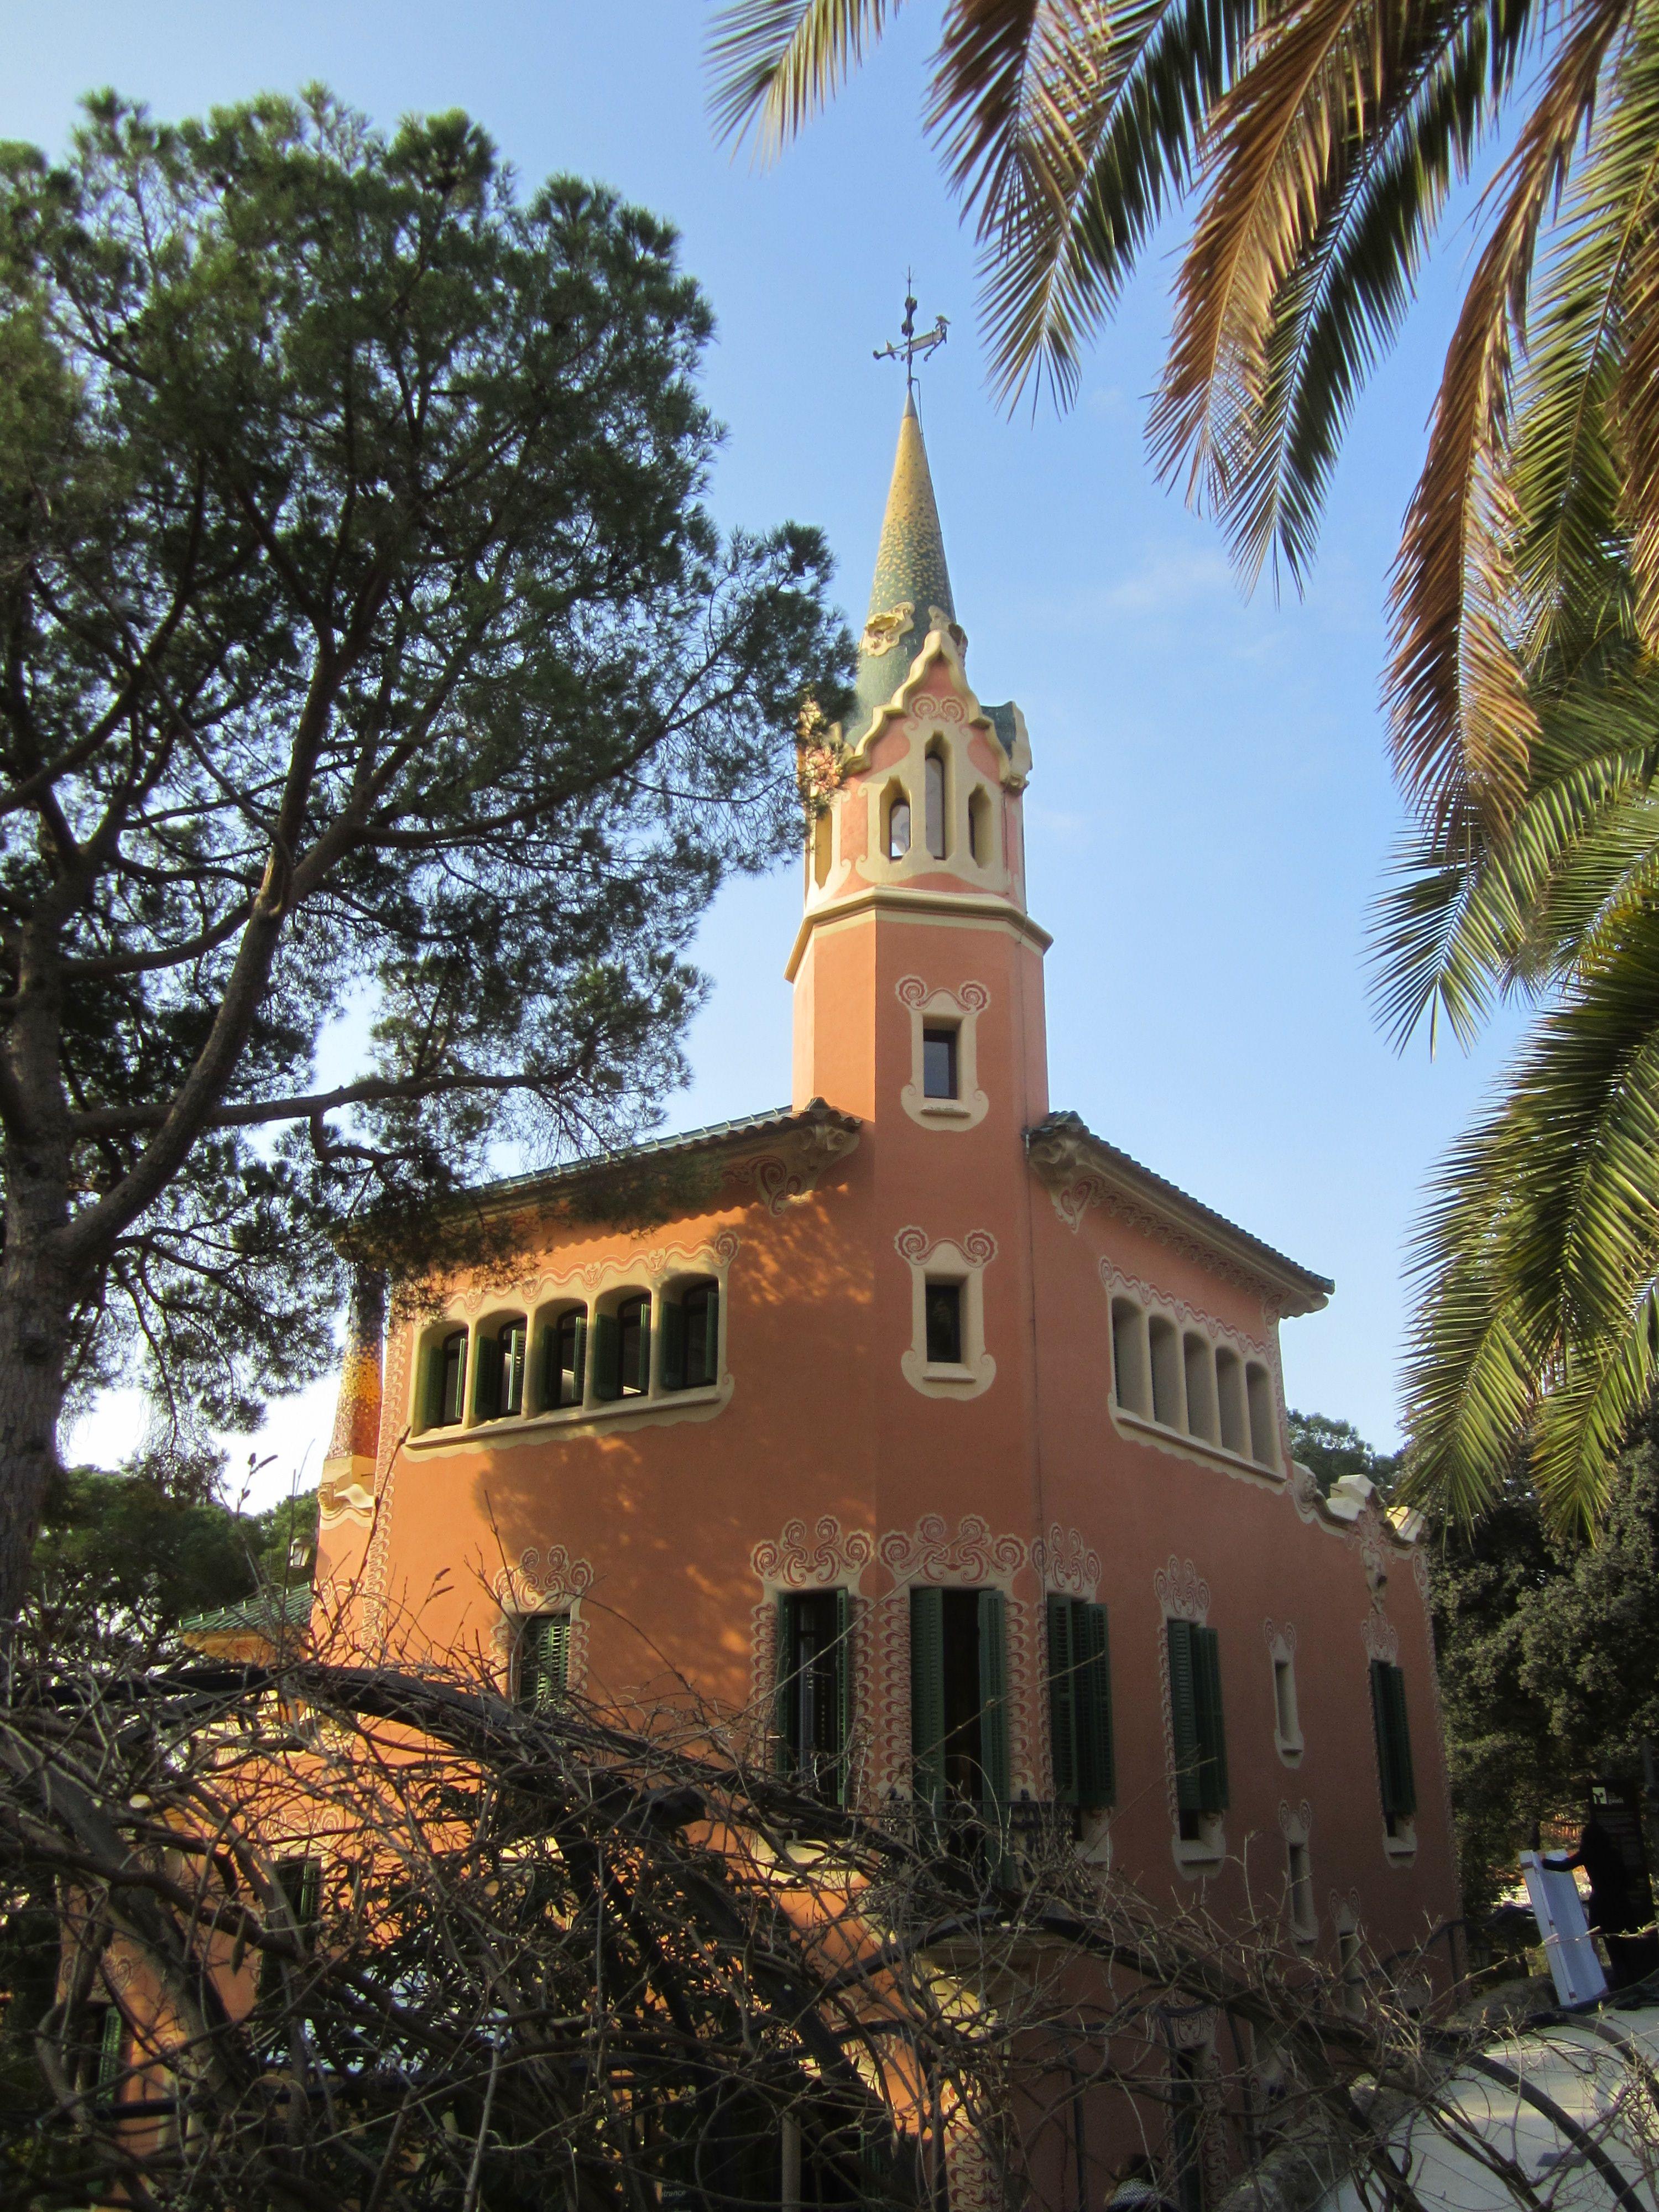 Casa Museo Gaudi.Casa Museo Gaudi En El Park Guell Places To Visit Museums